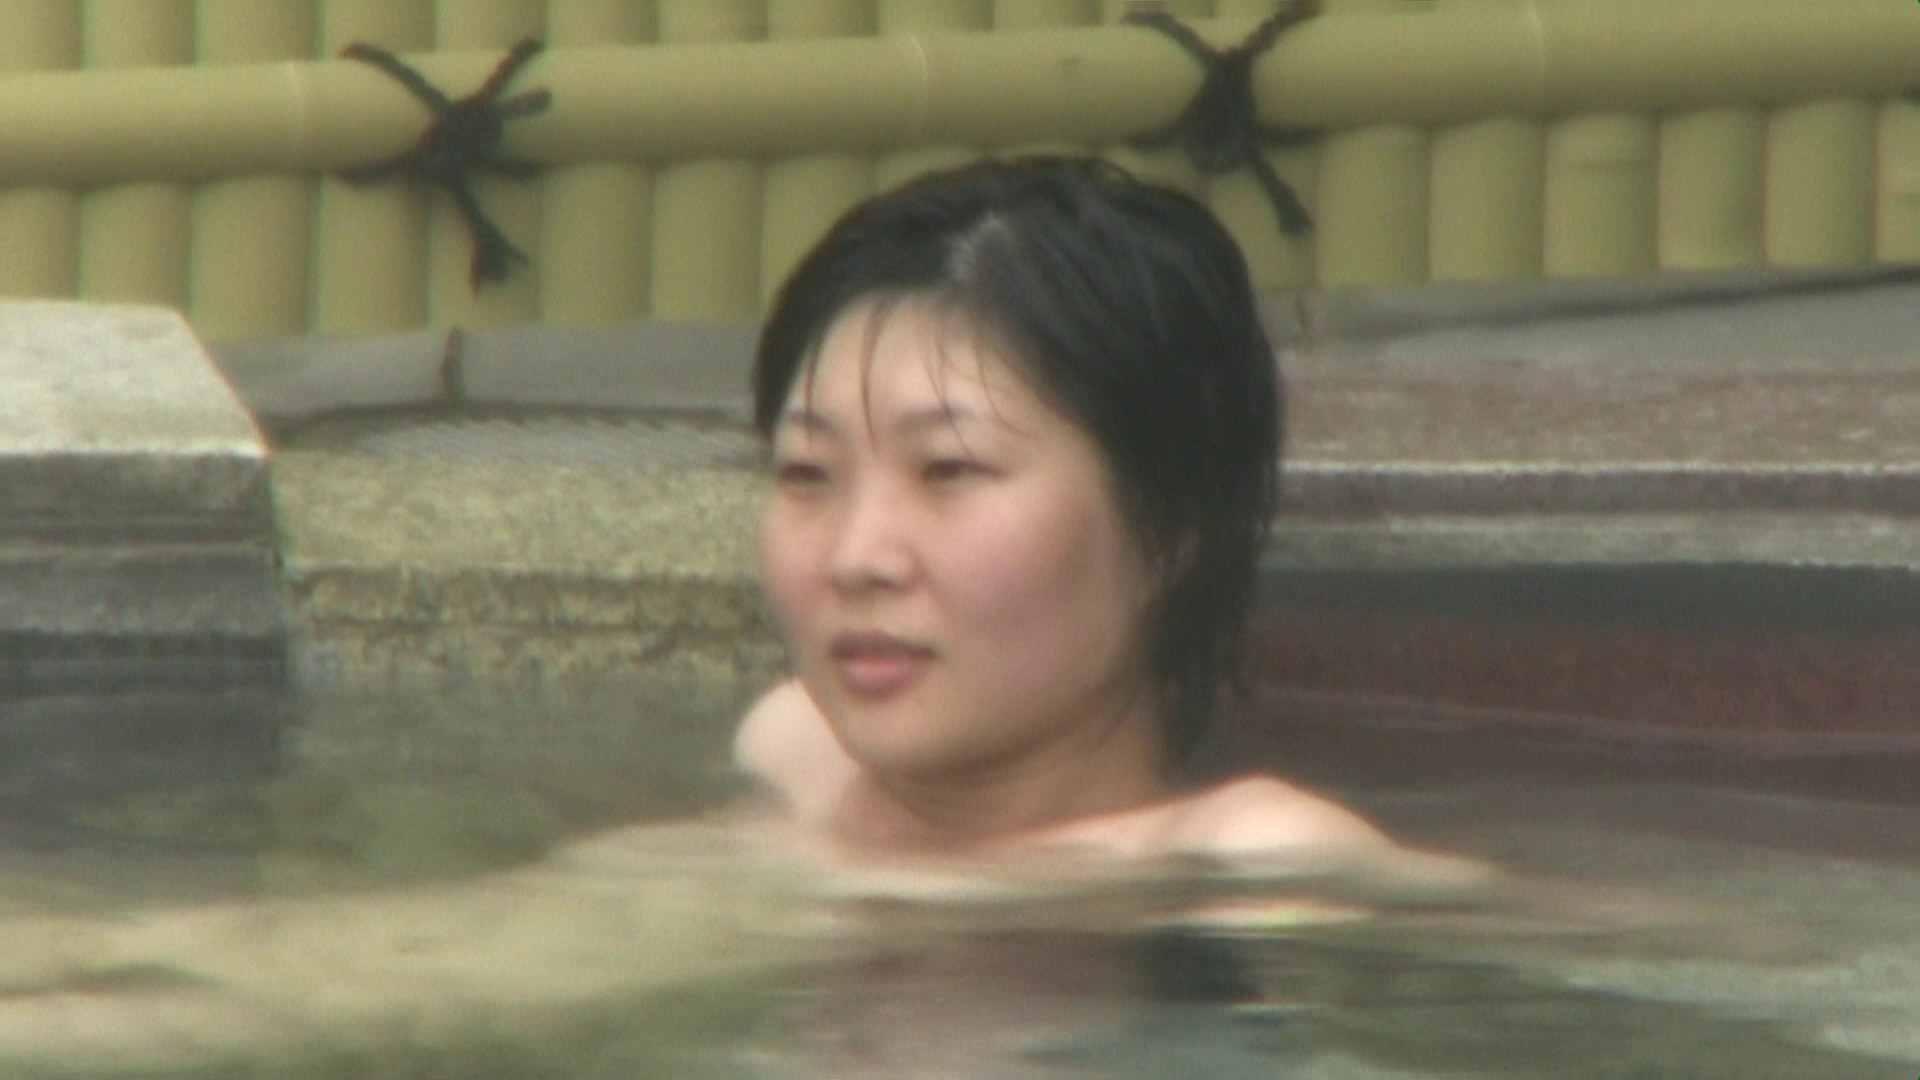 Aquaな露天風呂Vol.75【VIP限定】 露天風呂編 | 盗撮シリーズ  99PIX 7